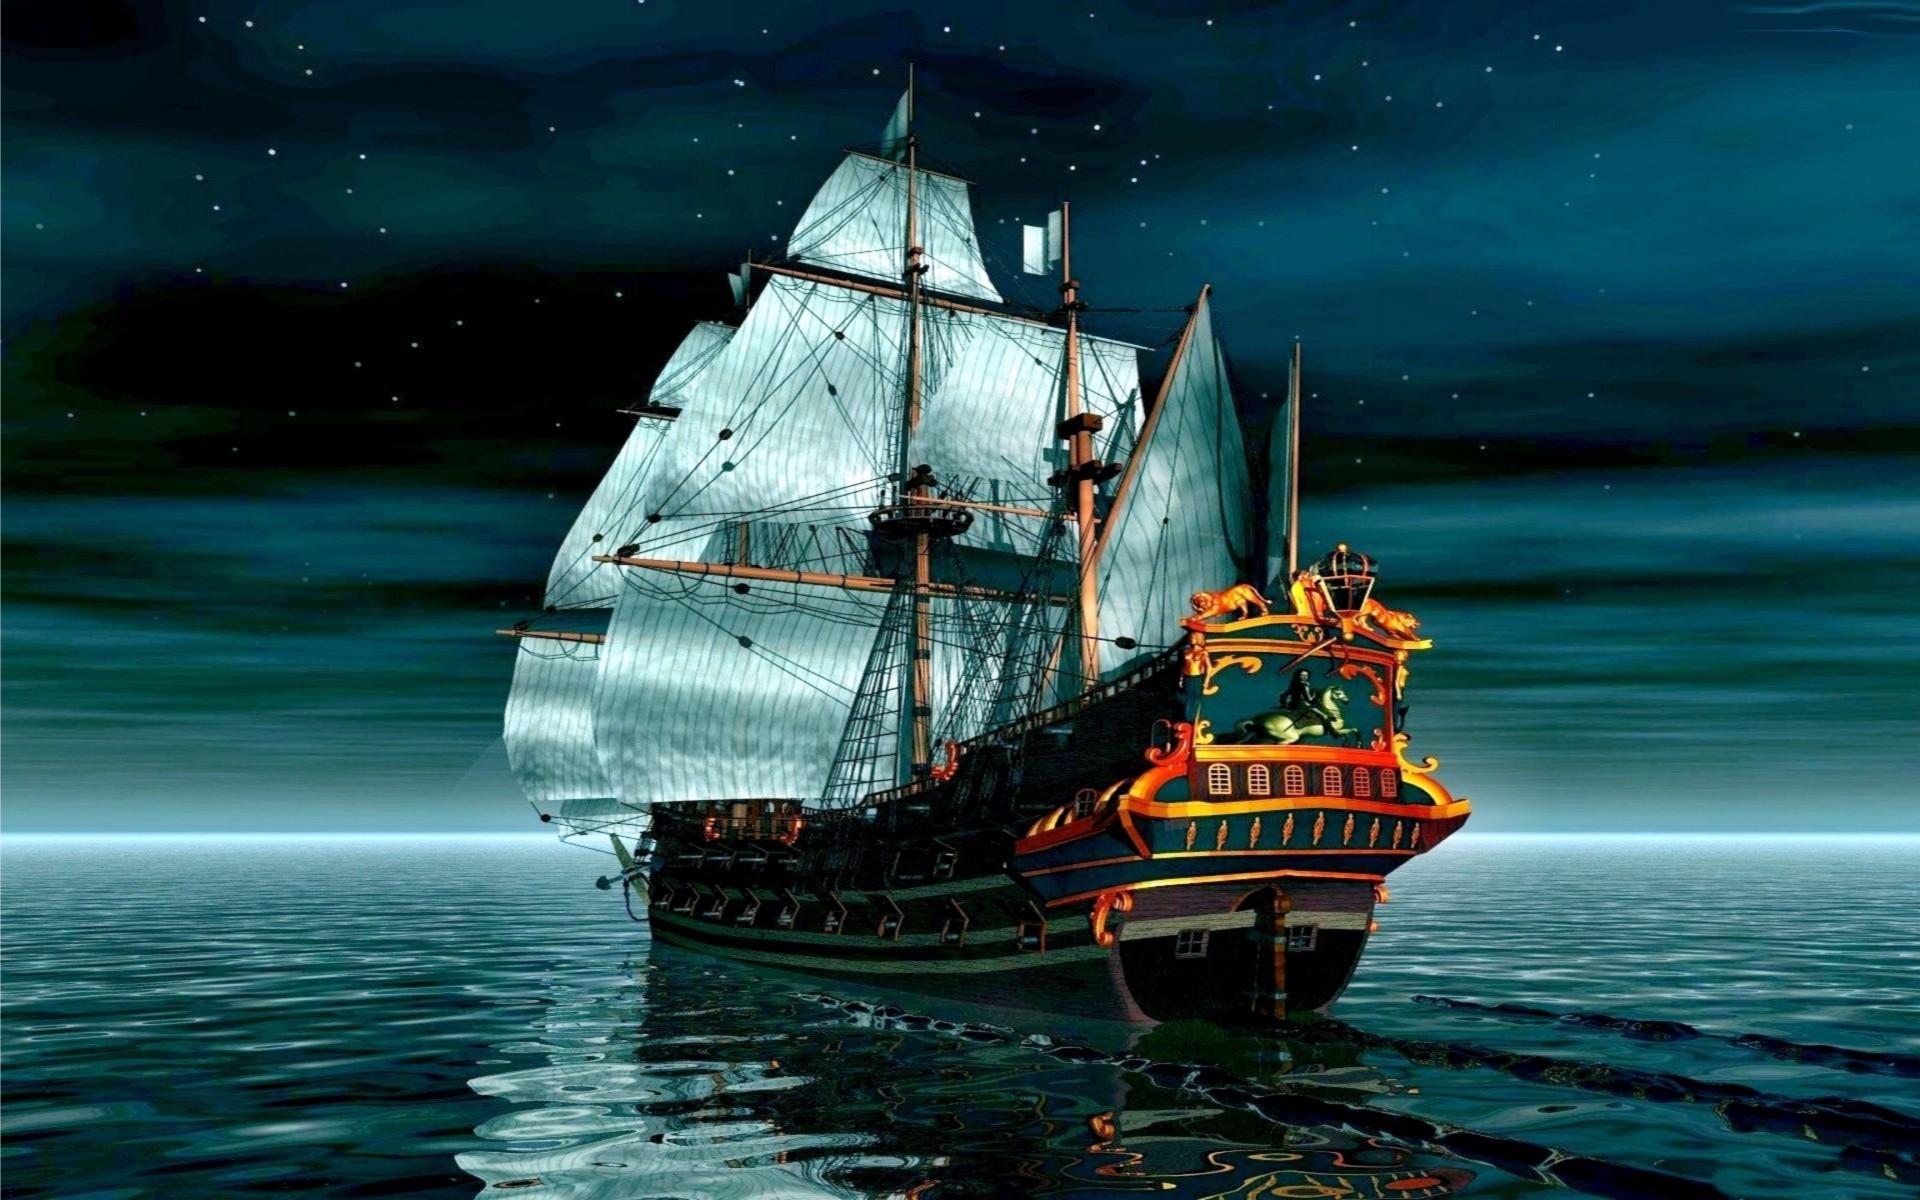 Free Download Pirate Ship 3d 4k Wallpapers 4k Wallpaper